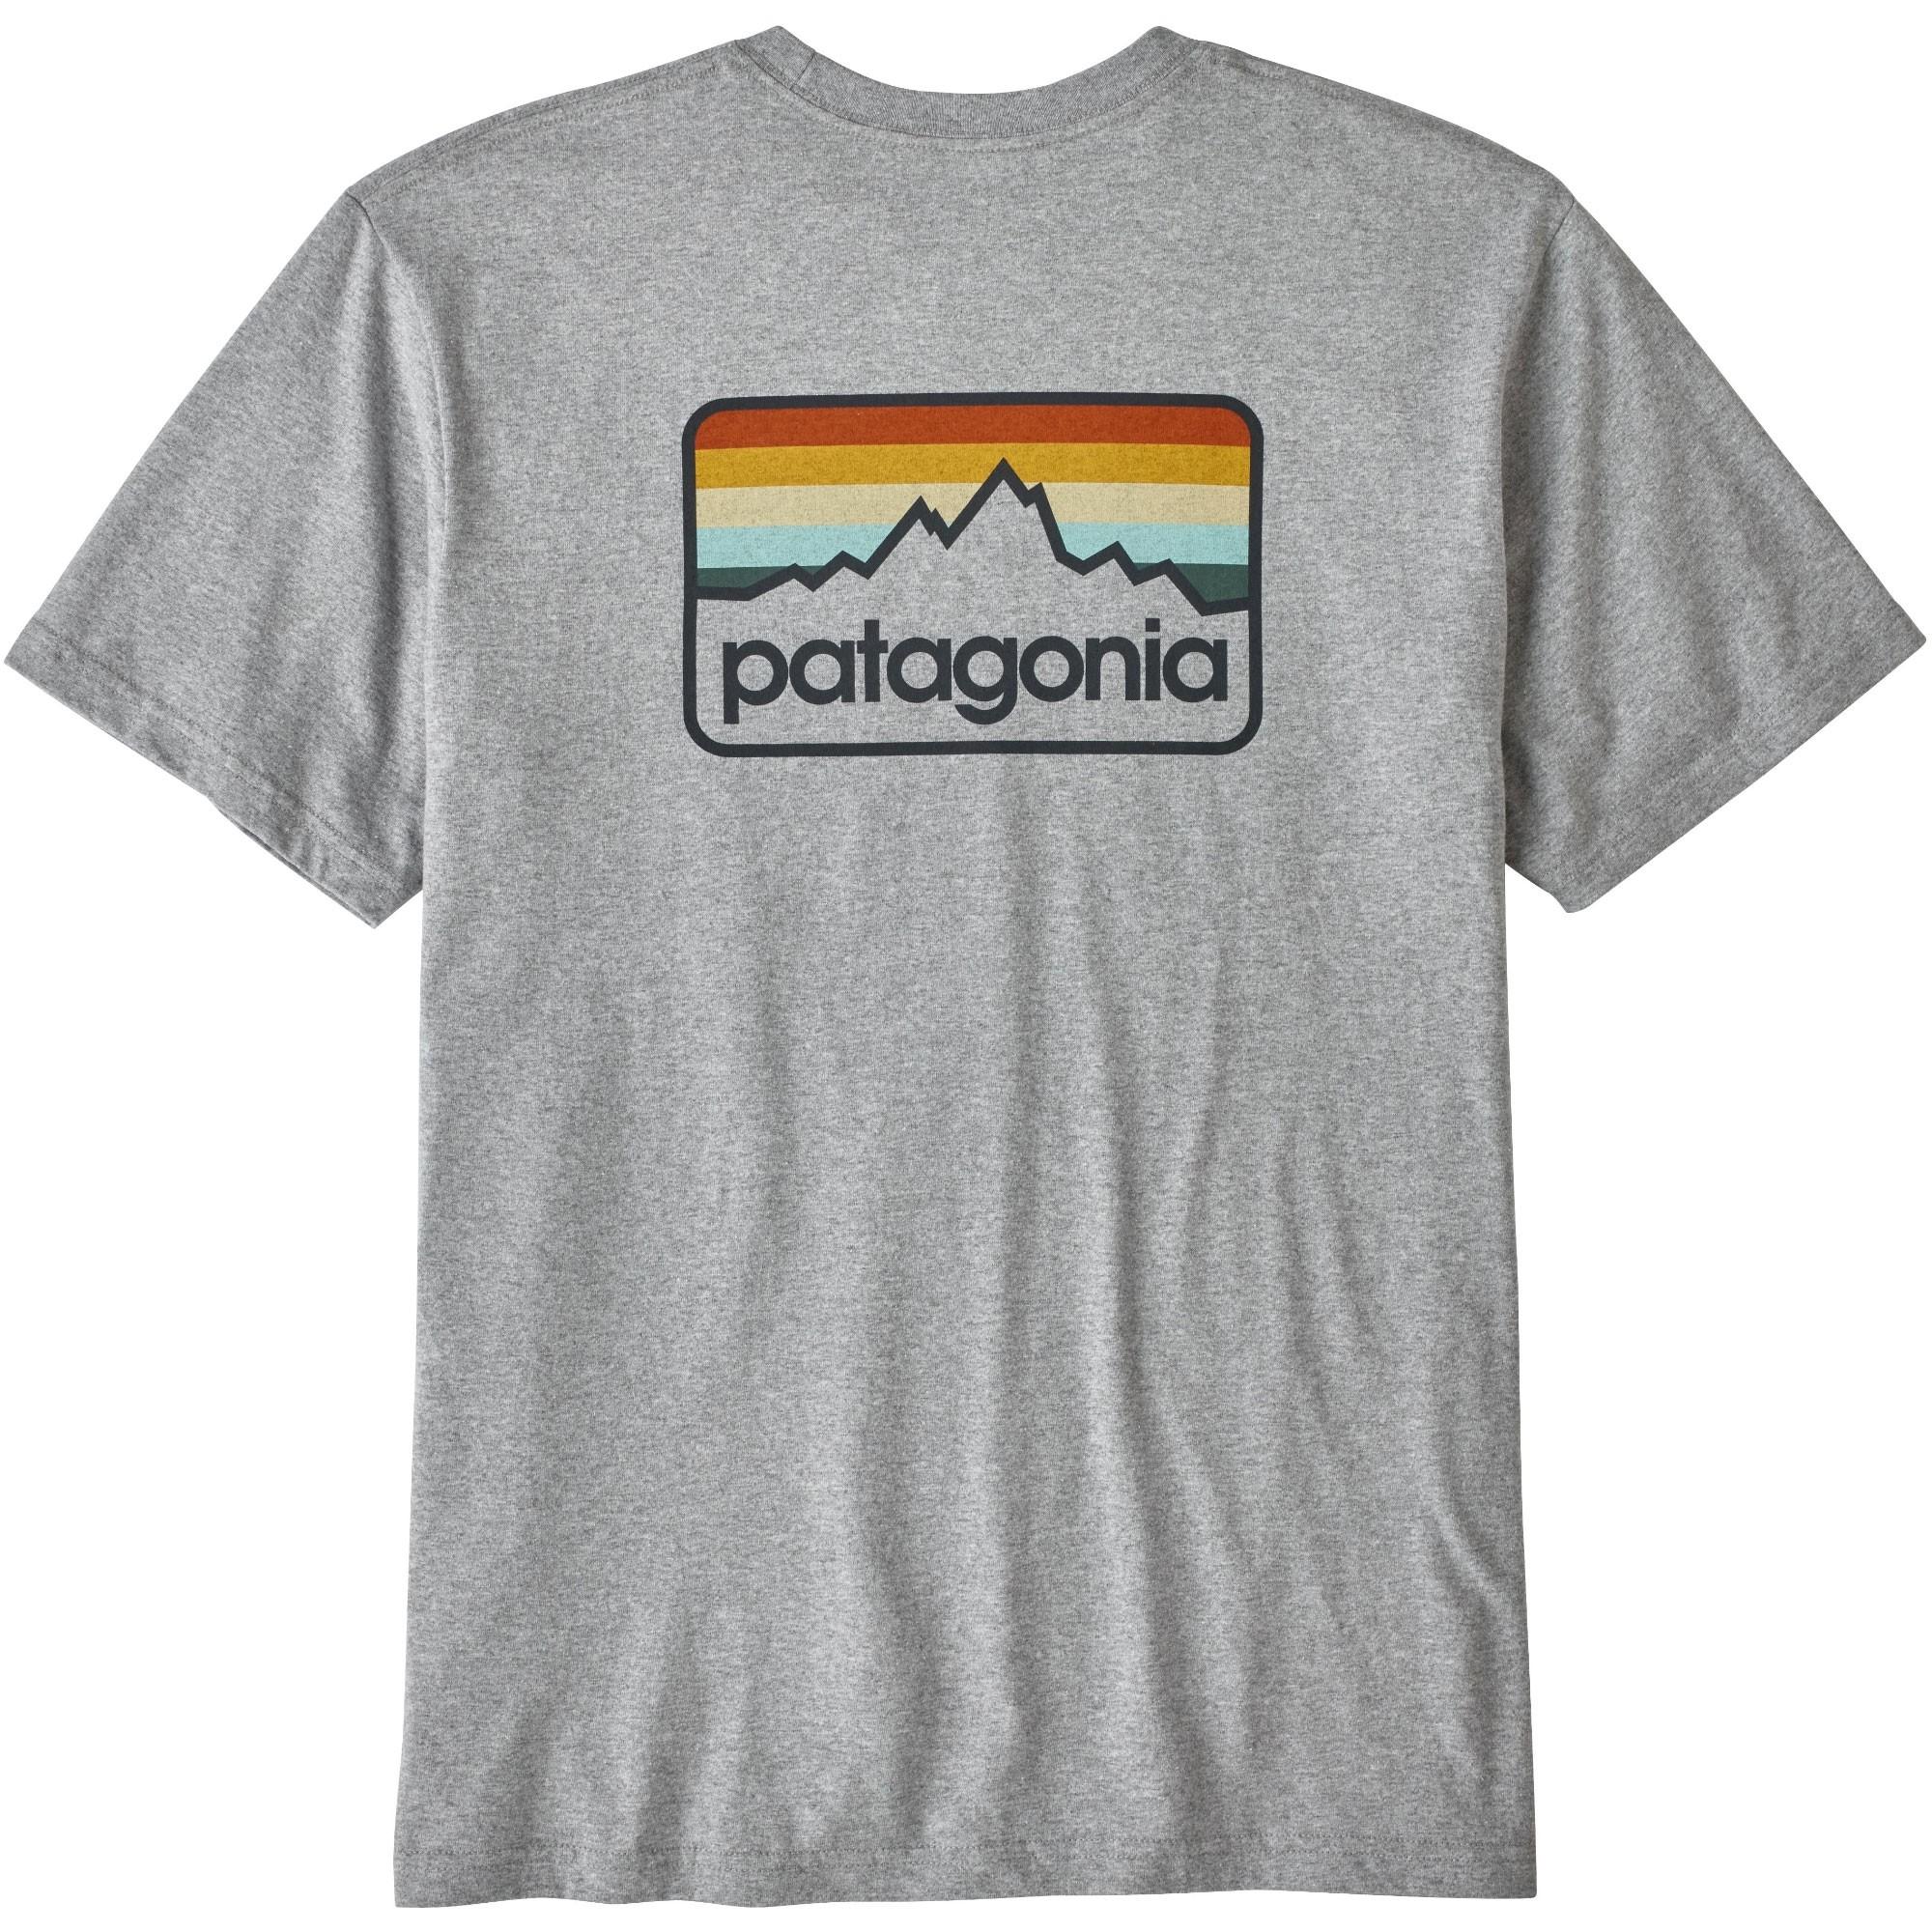 The Patagonia Line Logo Badge Responsibili-Tee T-Shirt Drifter Grey-Smolder Blue